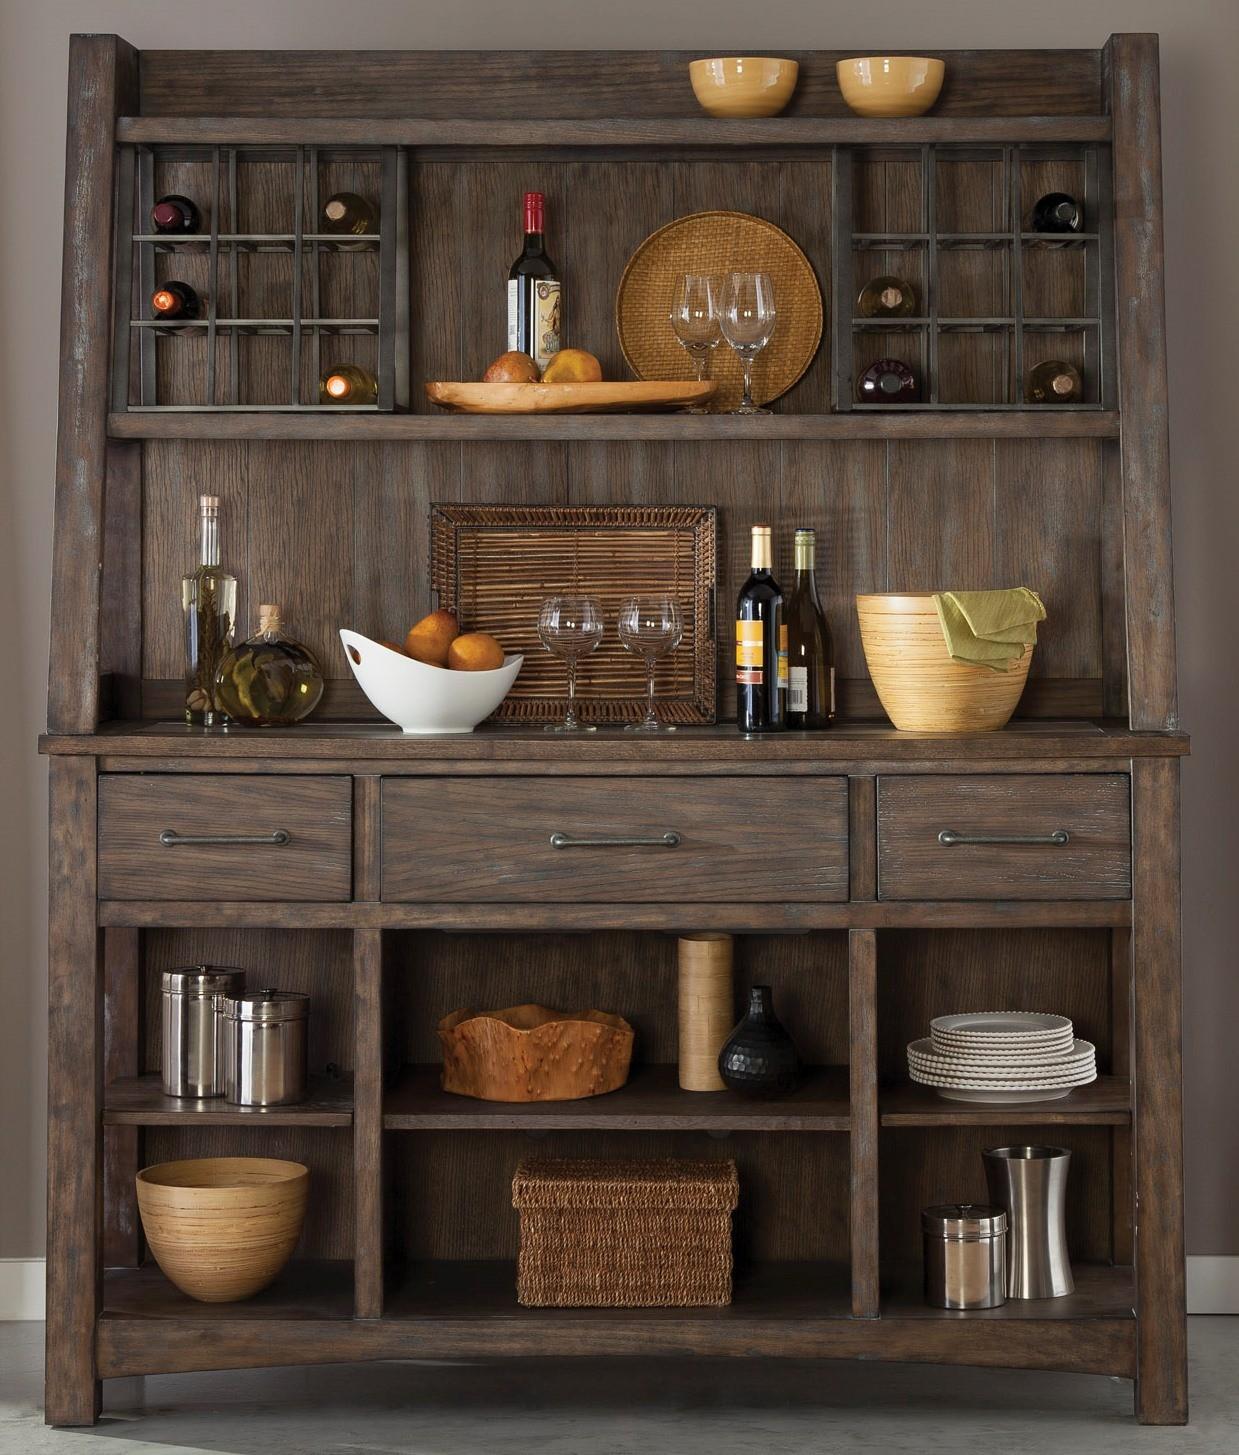 stone brook kitchen island dining room set from liberty kitchen island dining set traditional wood rectangular